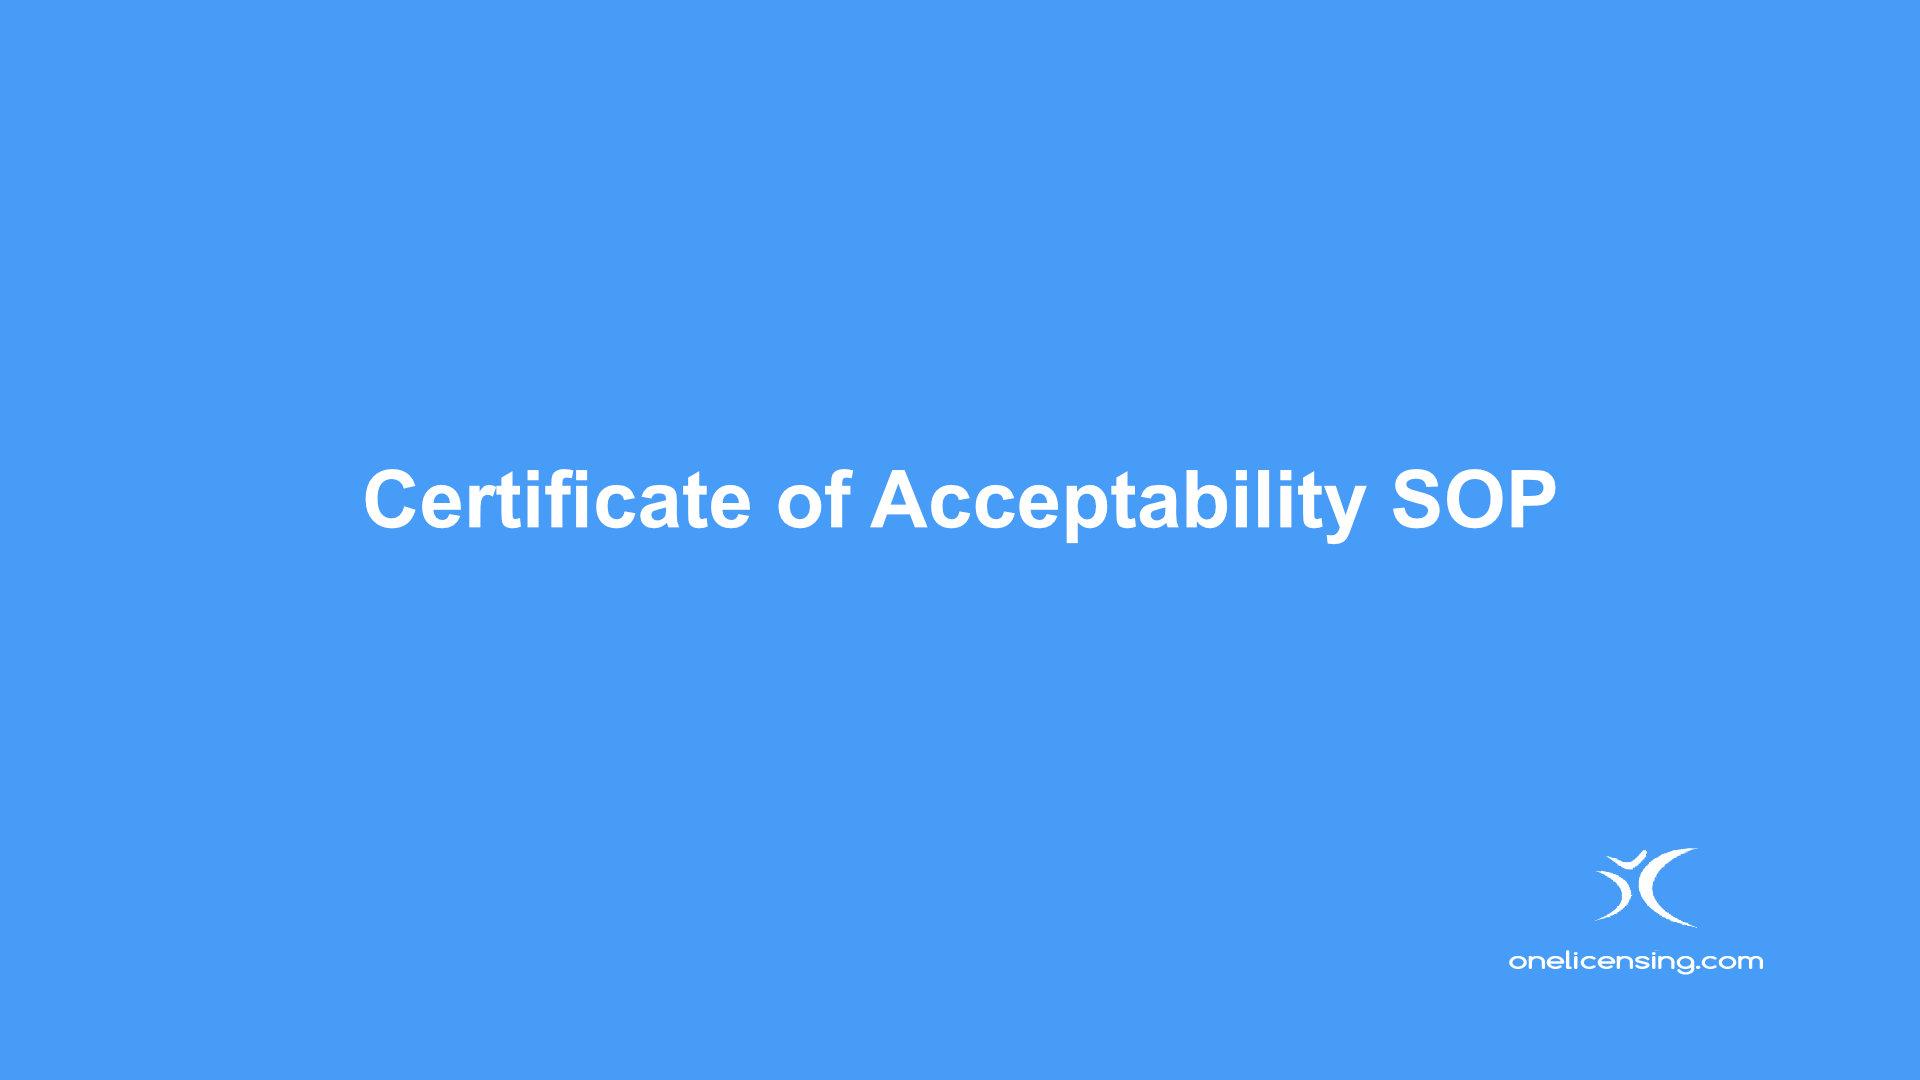 Certificate of Acceptability SOP